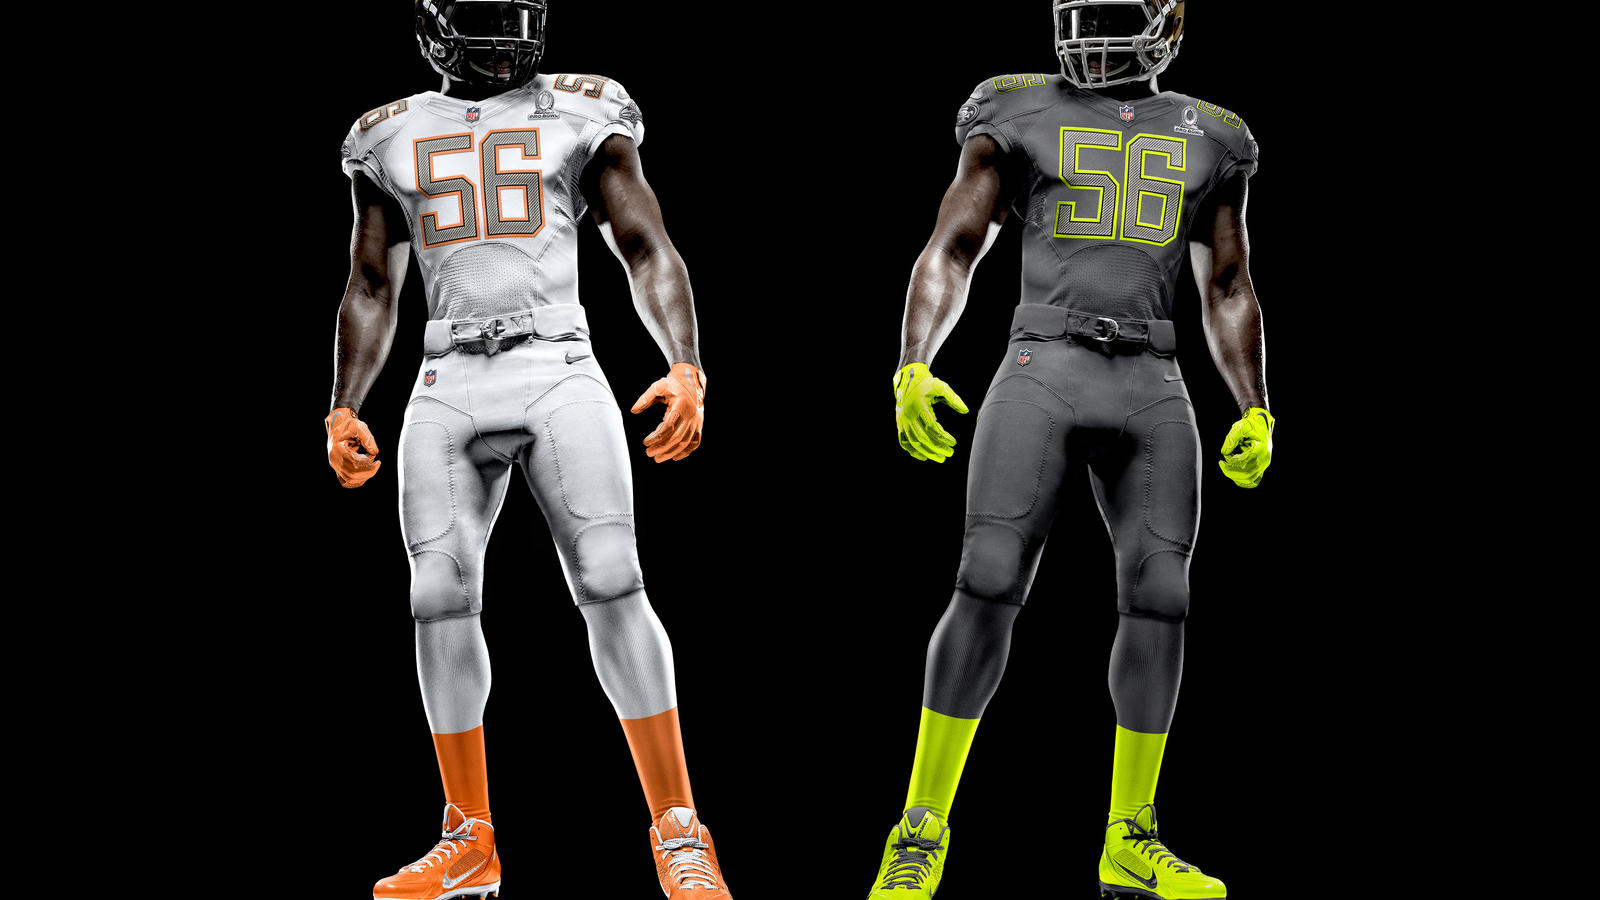 NFL Nike Elite 51 Pro Bowl Uniforms Unveiled - Nike News